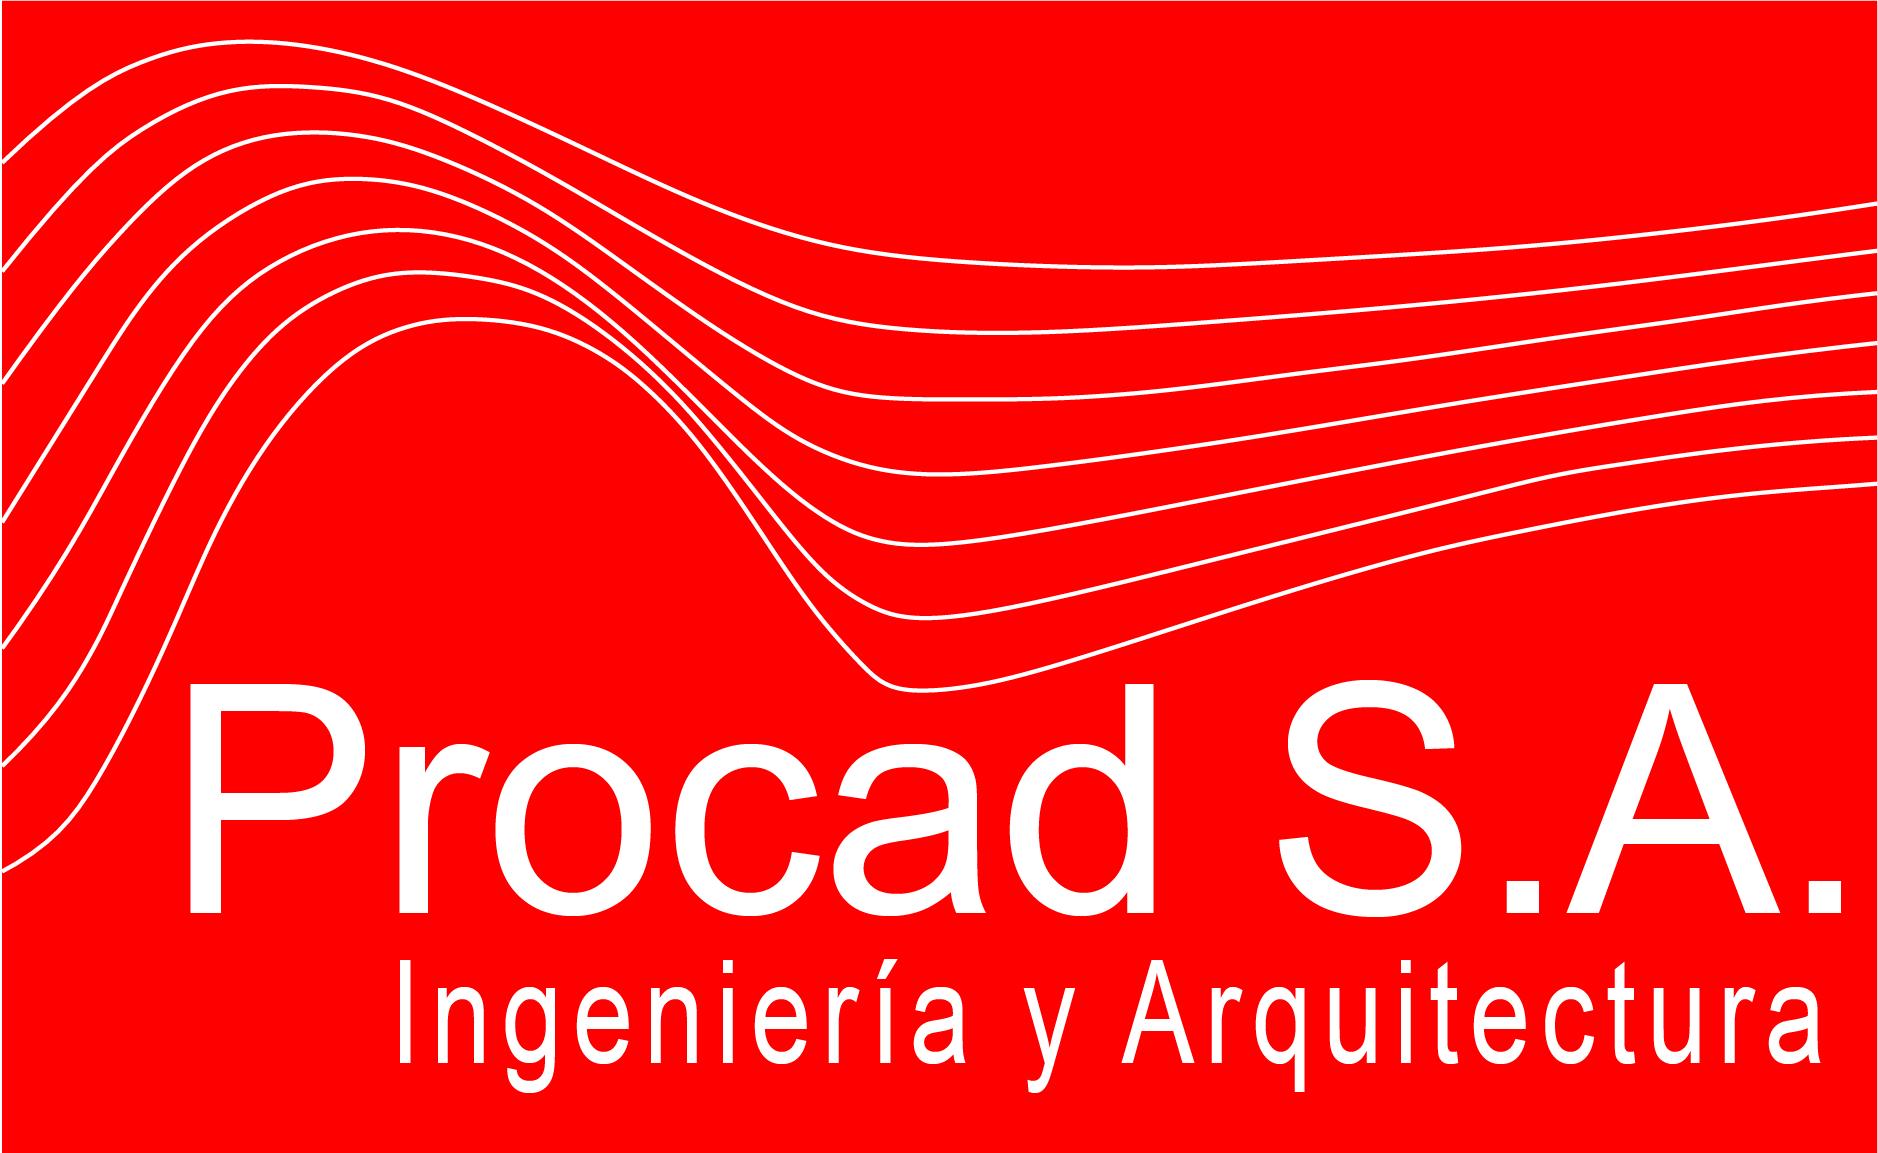 Procad, S.A.